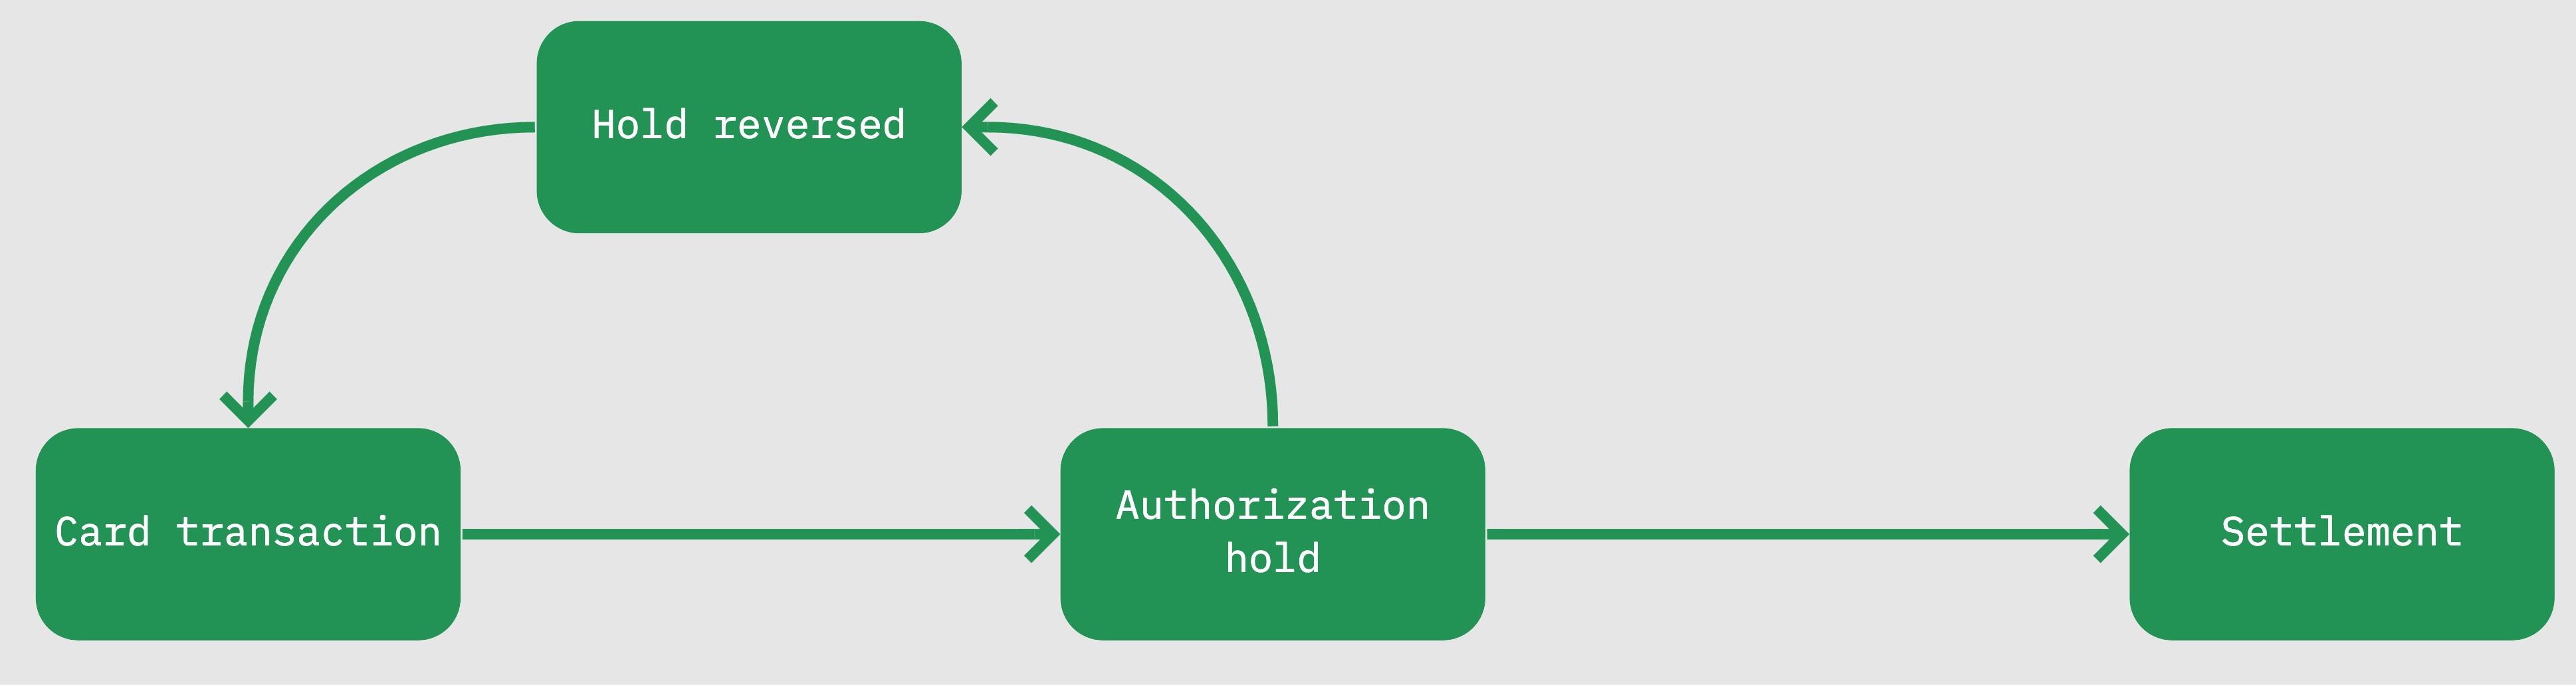 Authorization-hold-flow